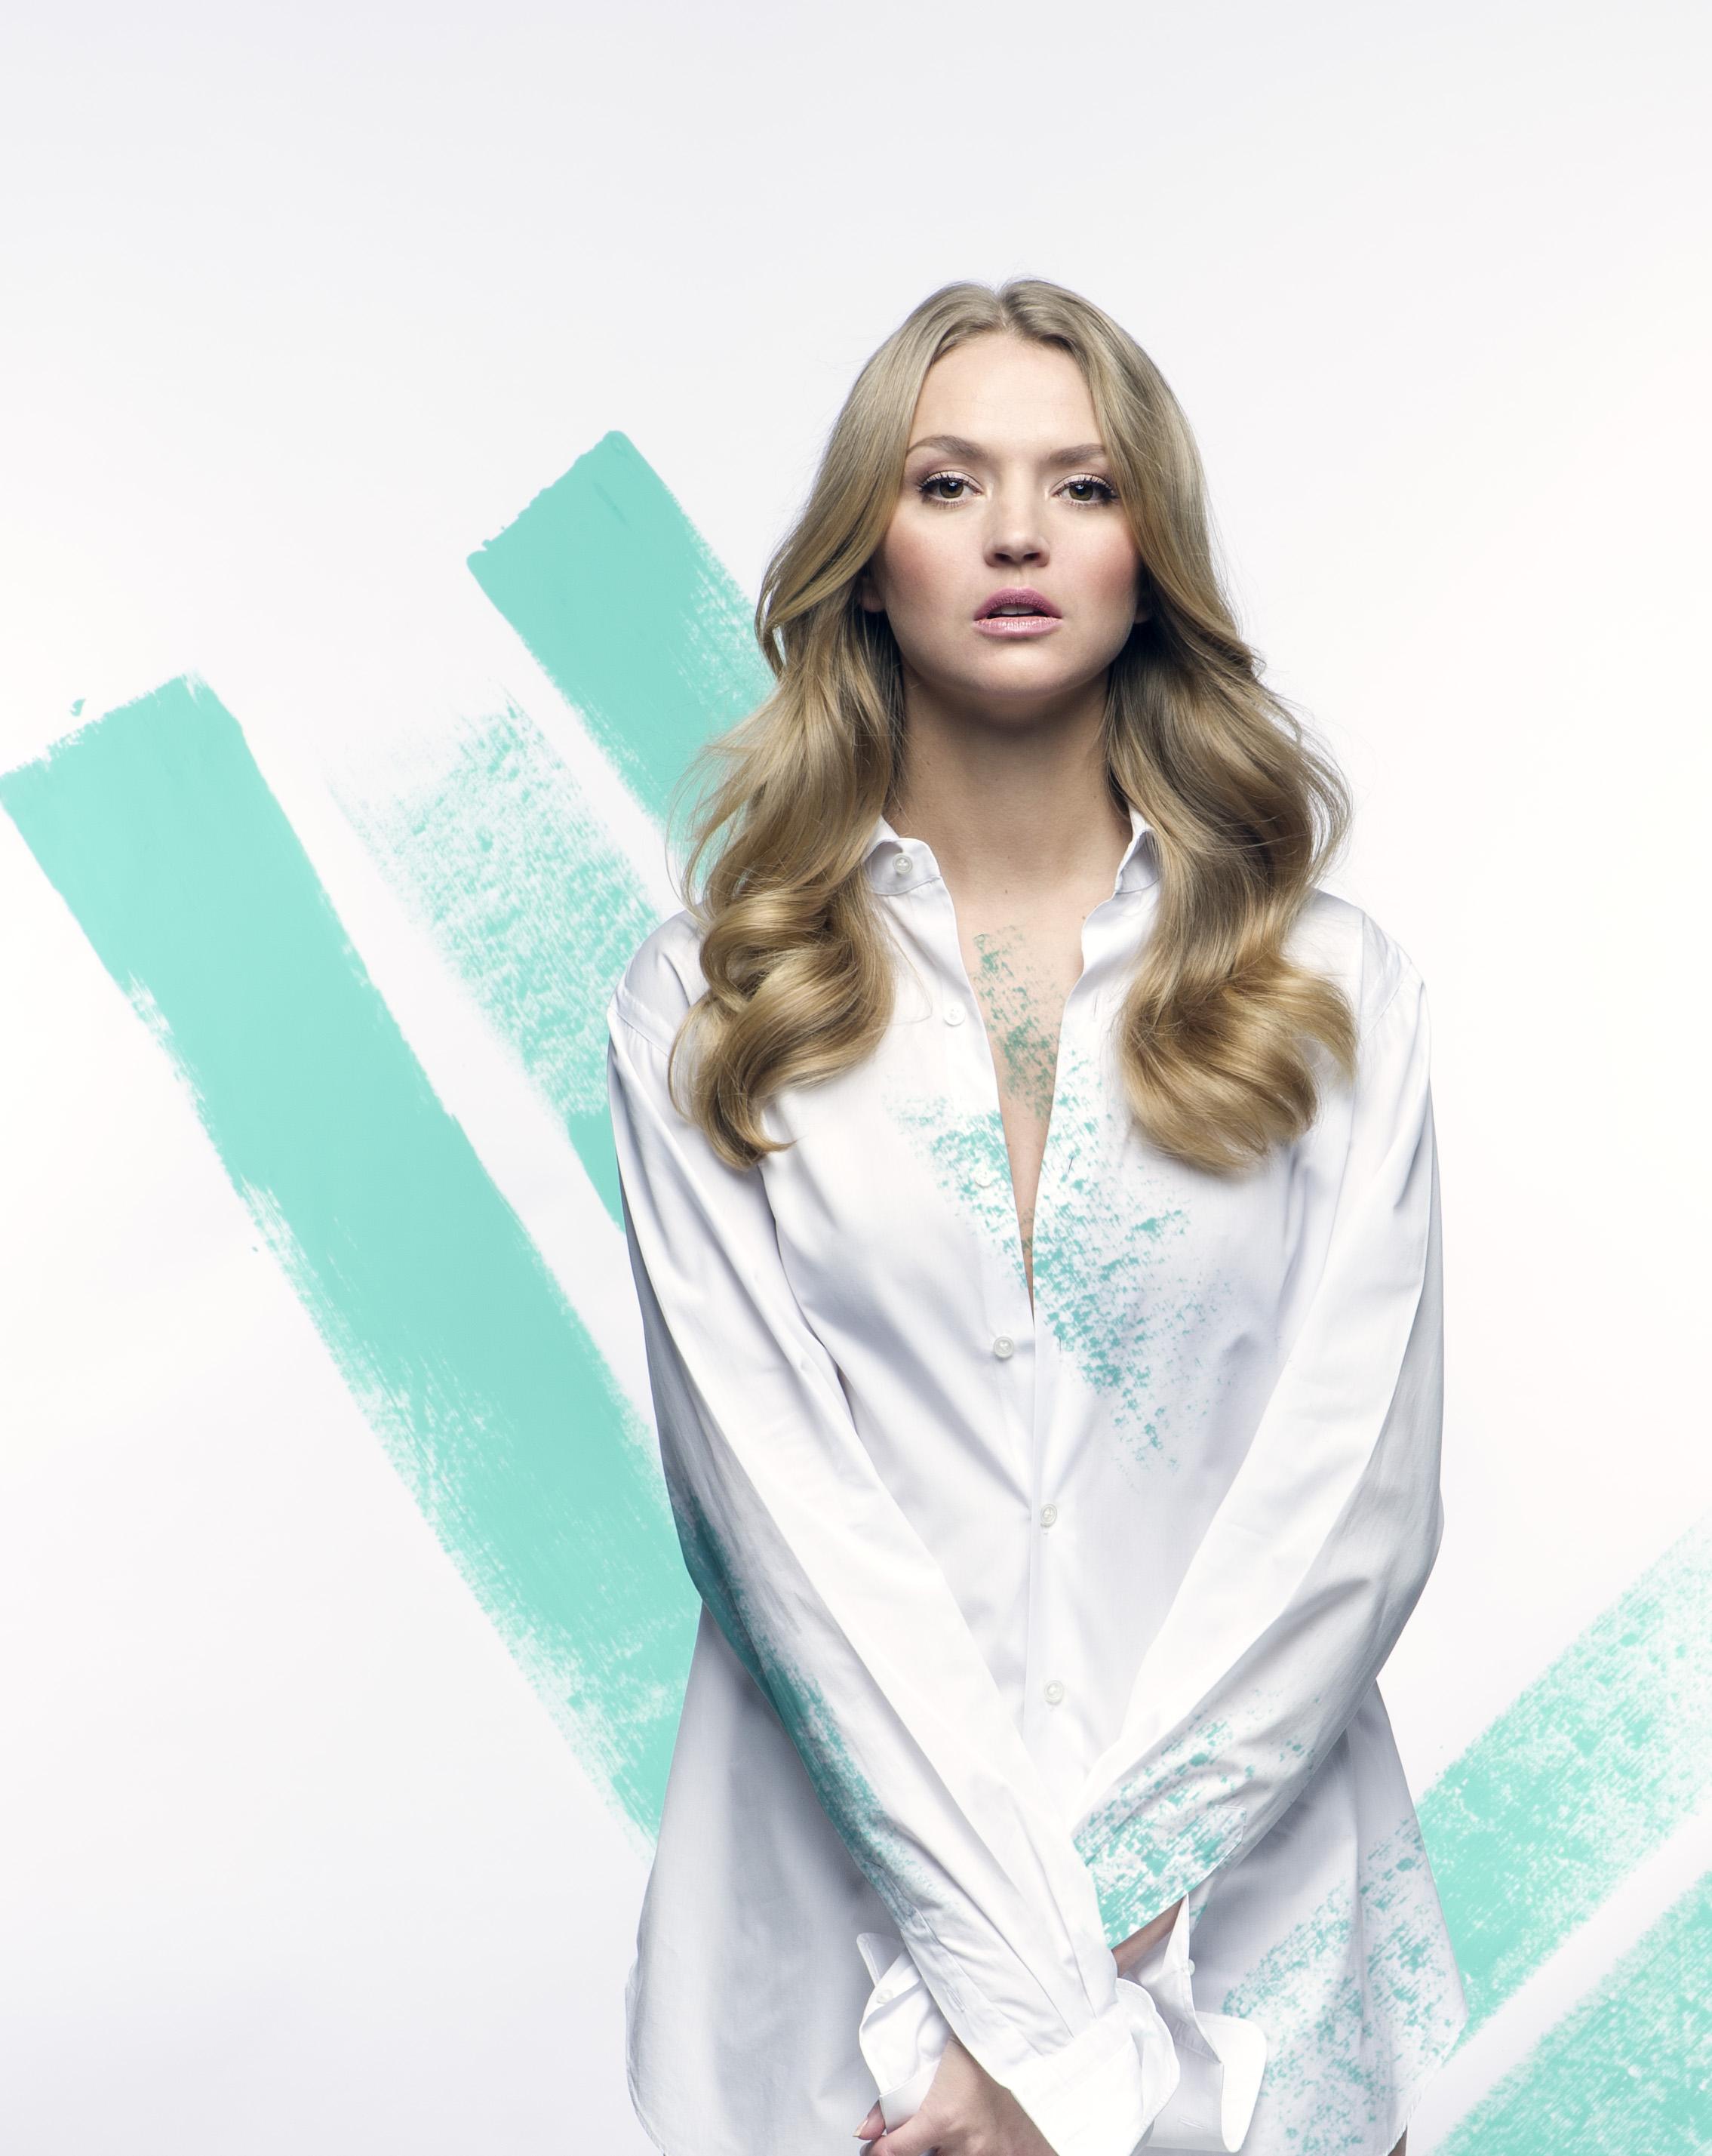 Model Nadine @ Max Models